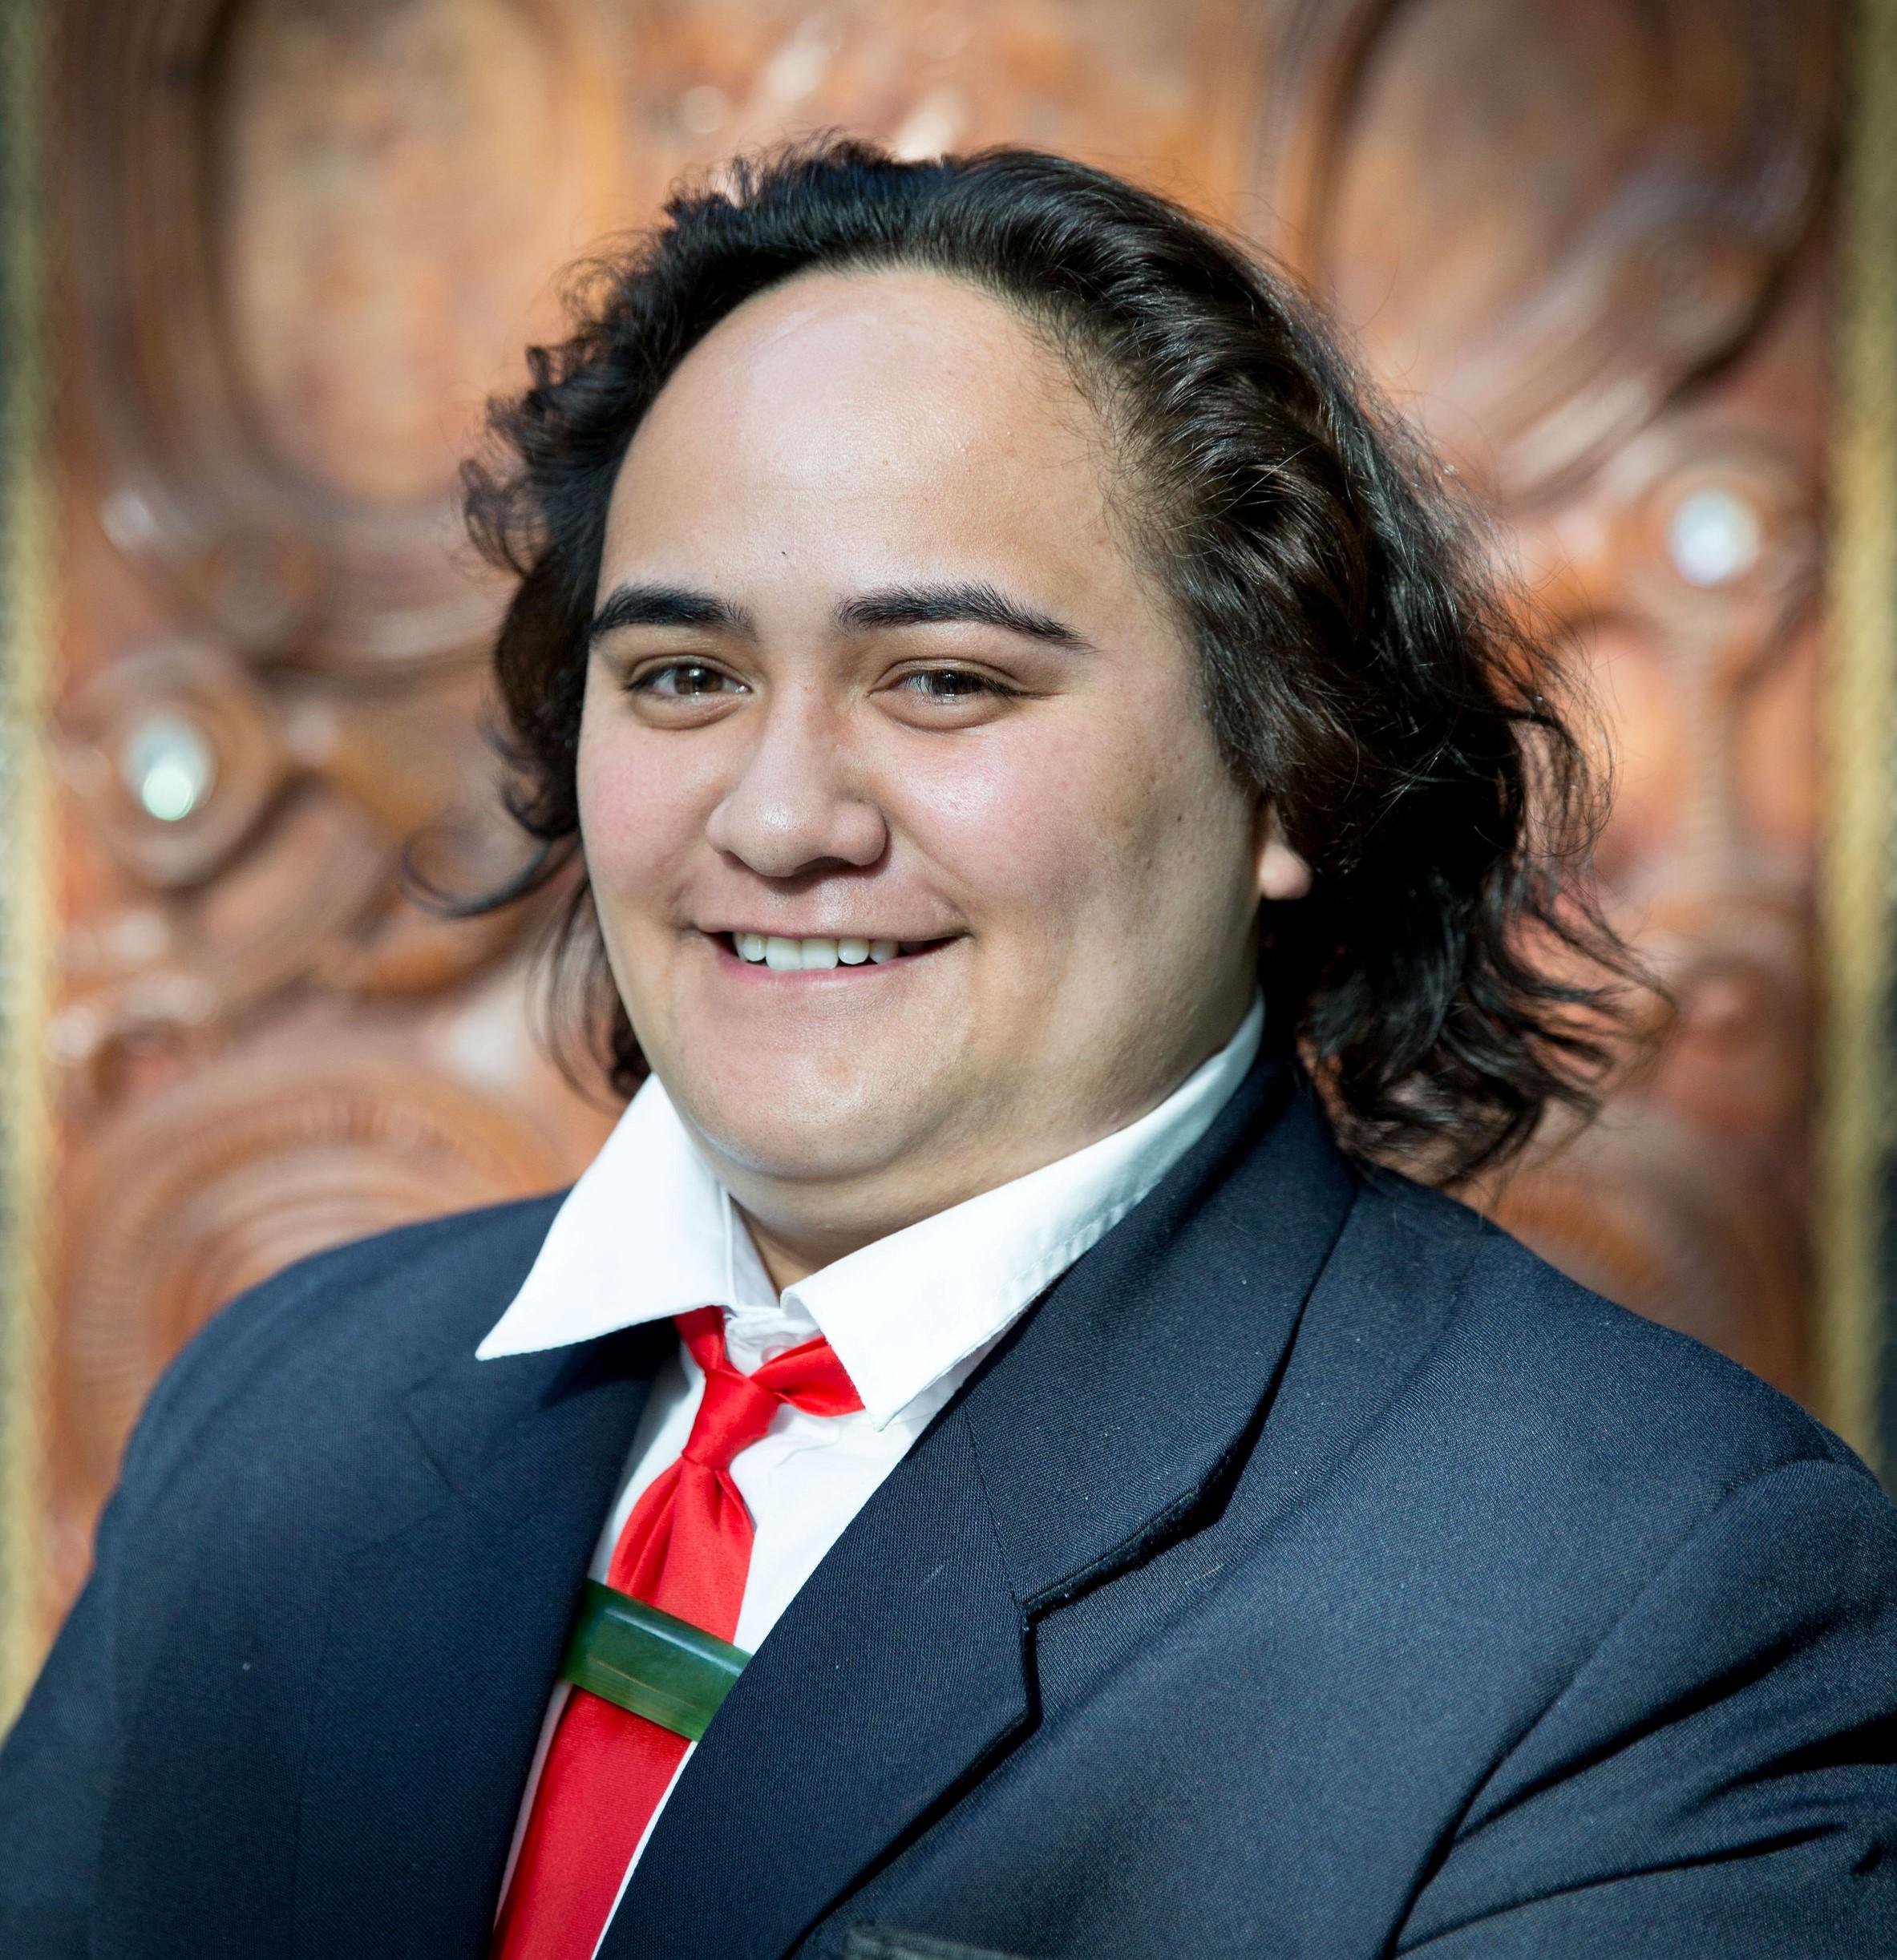 Rea, Career Navigator Student, Fairfield College Waikato